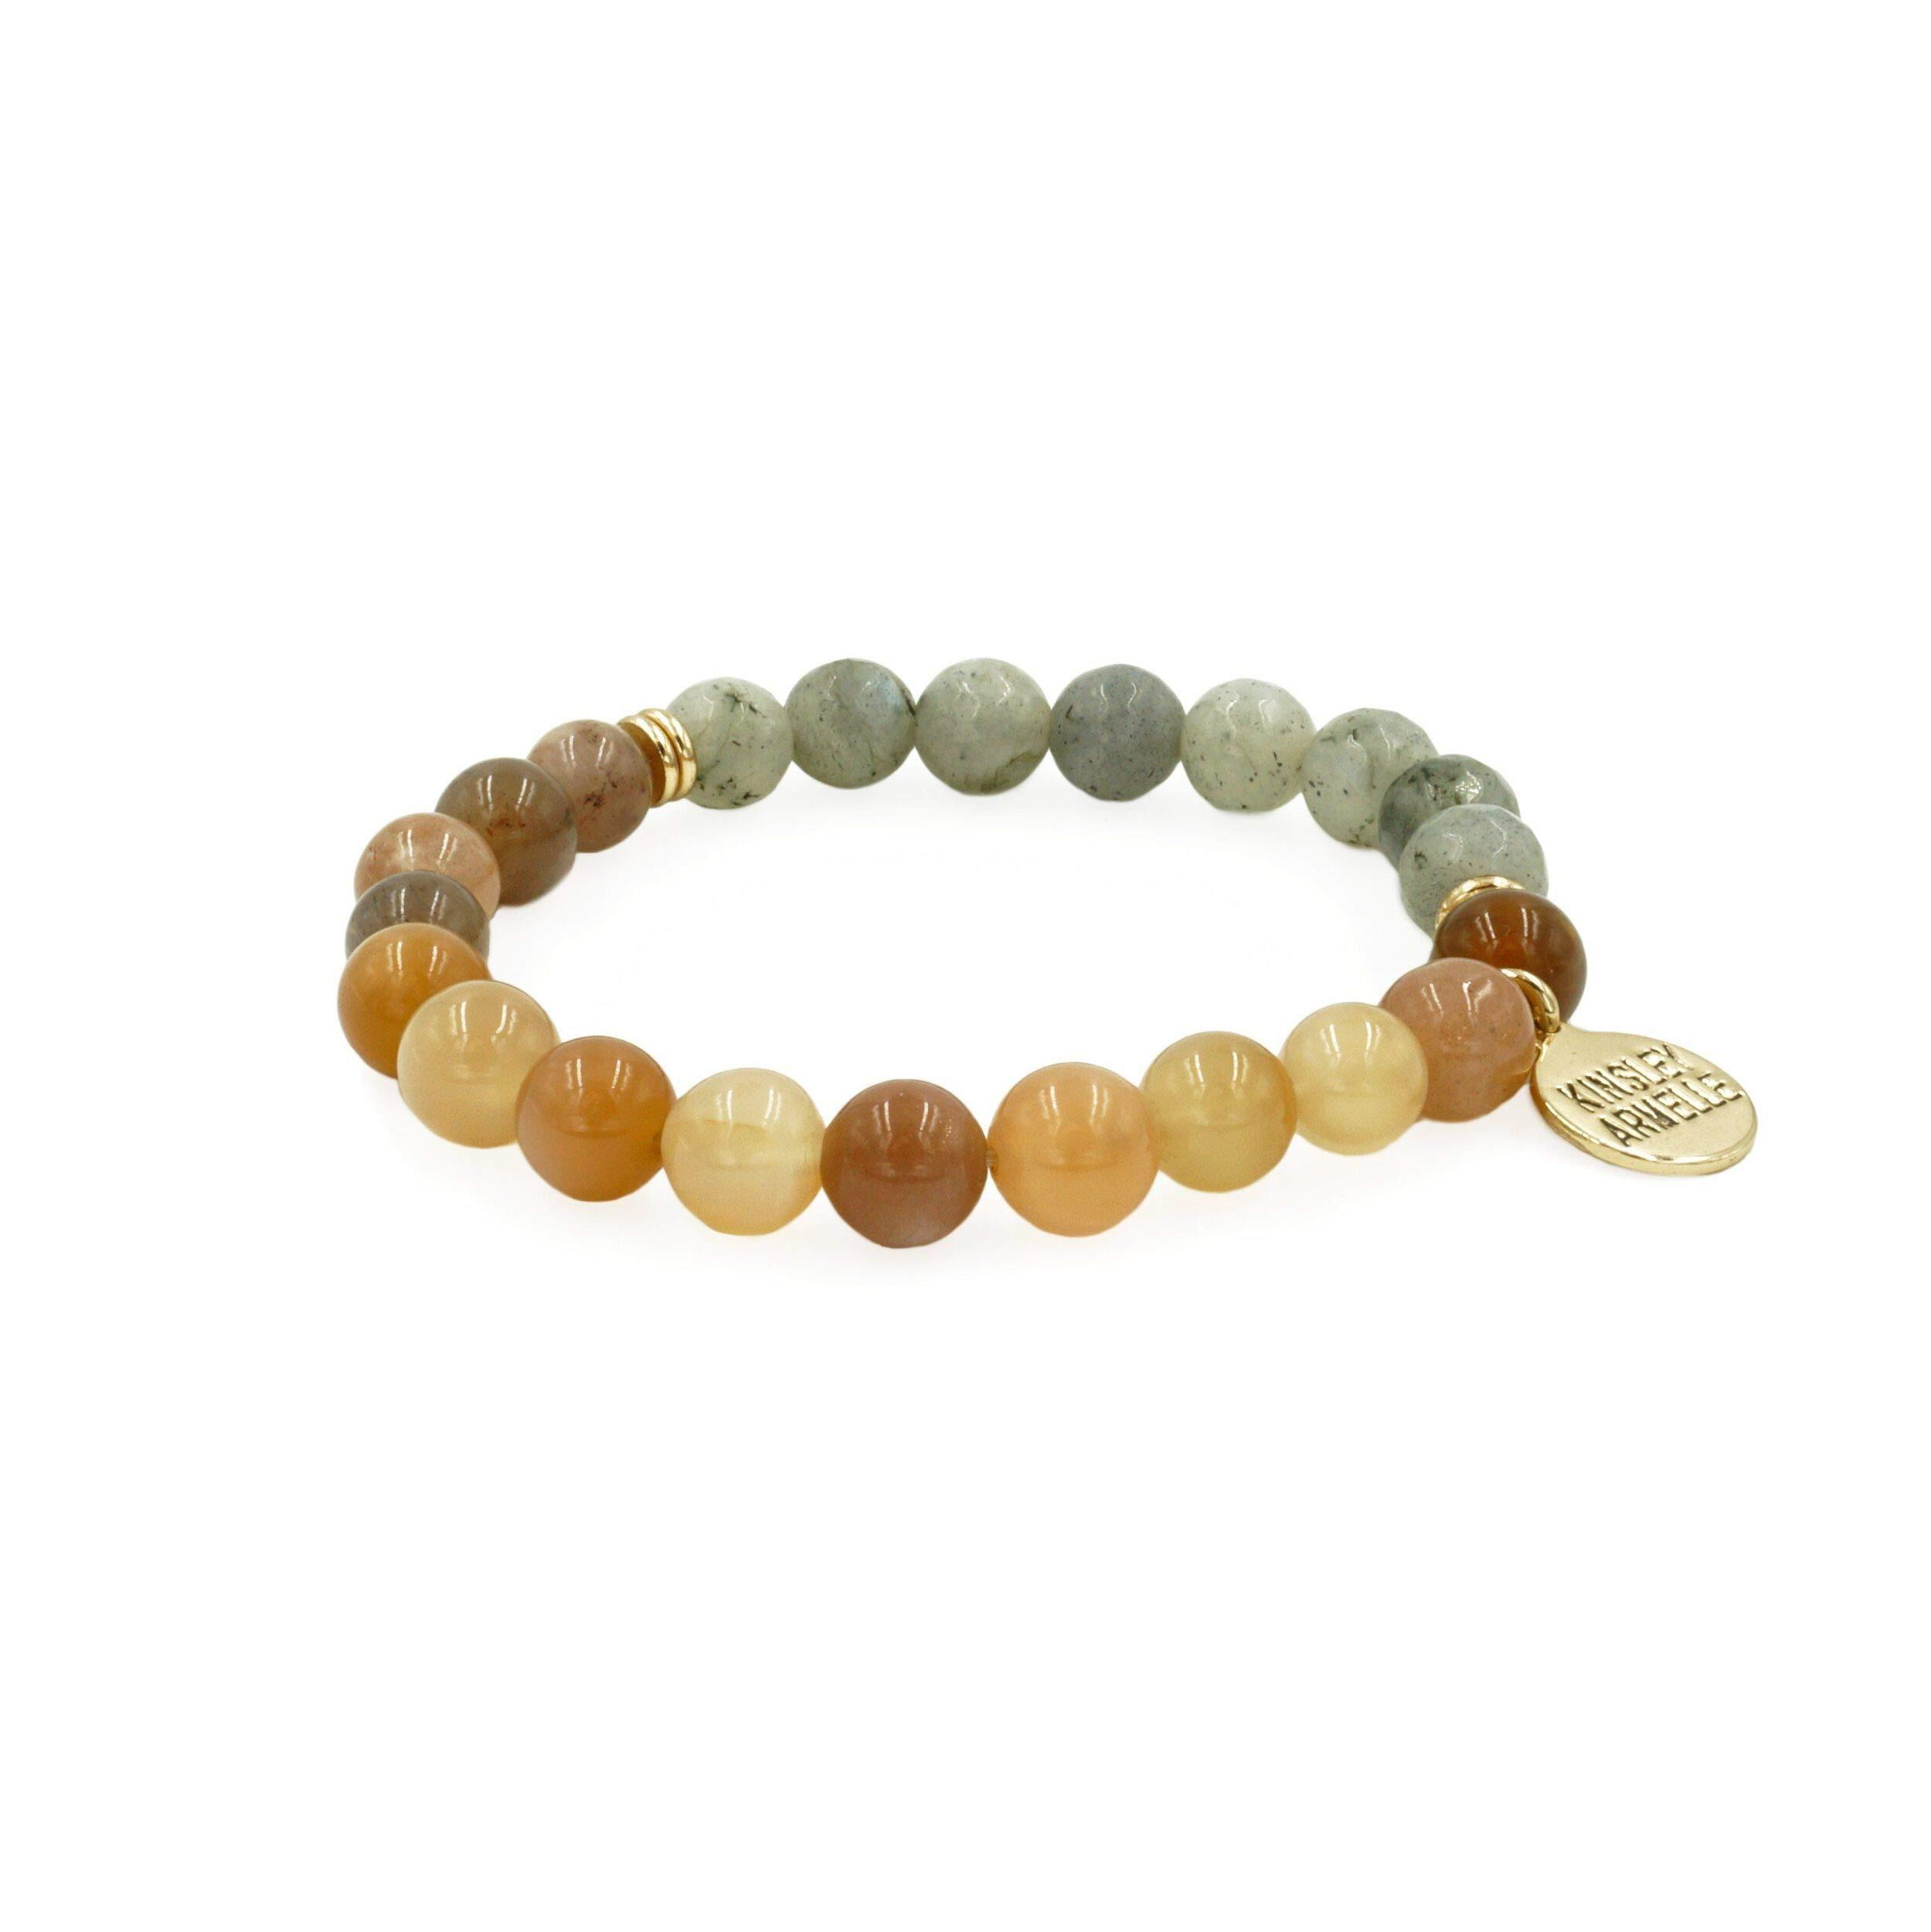 Kinsley Armelle Pixie Collection - Aragonite Bracelet